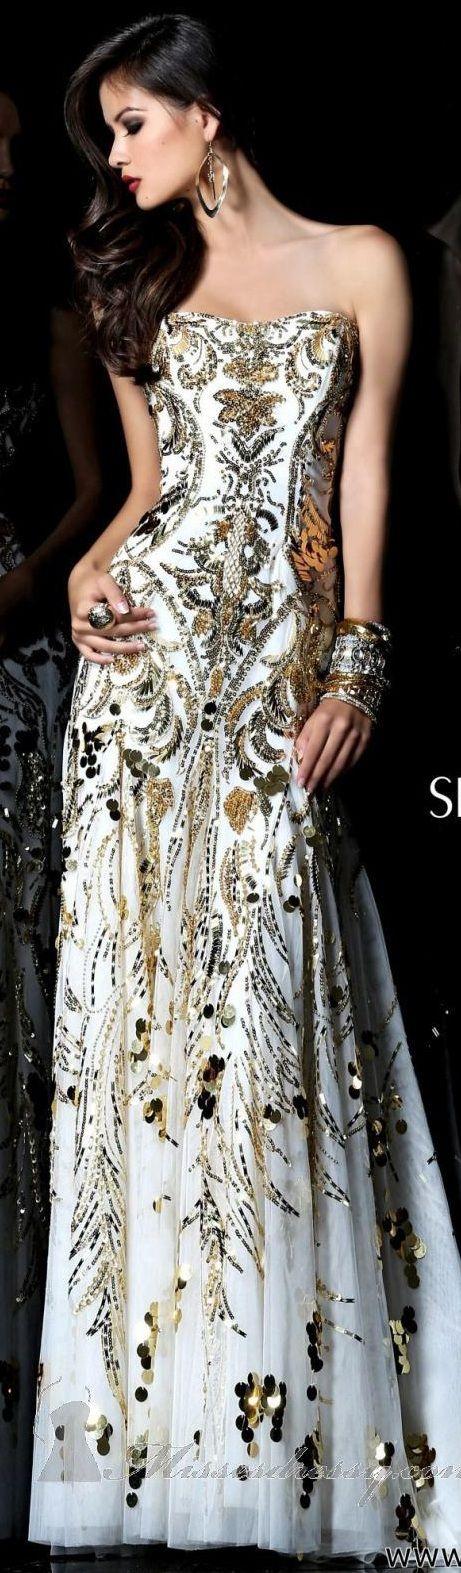 Sherri Hill couture ~: